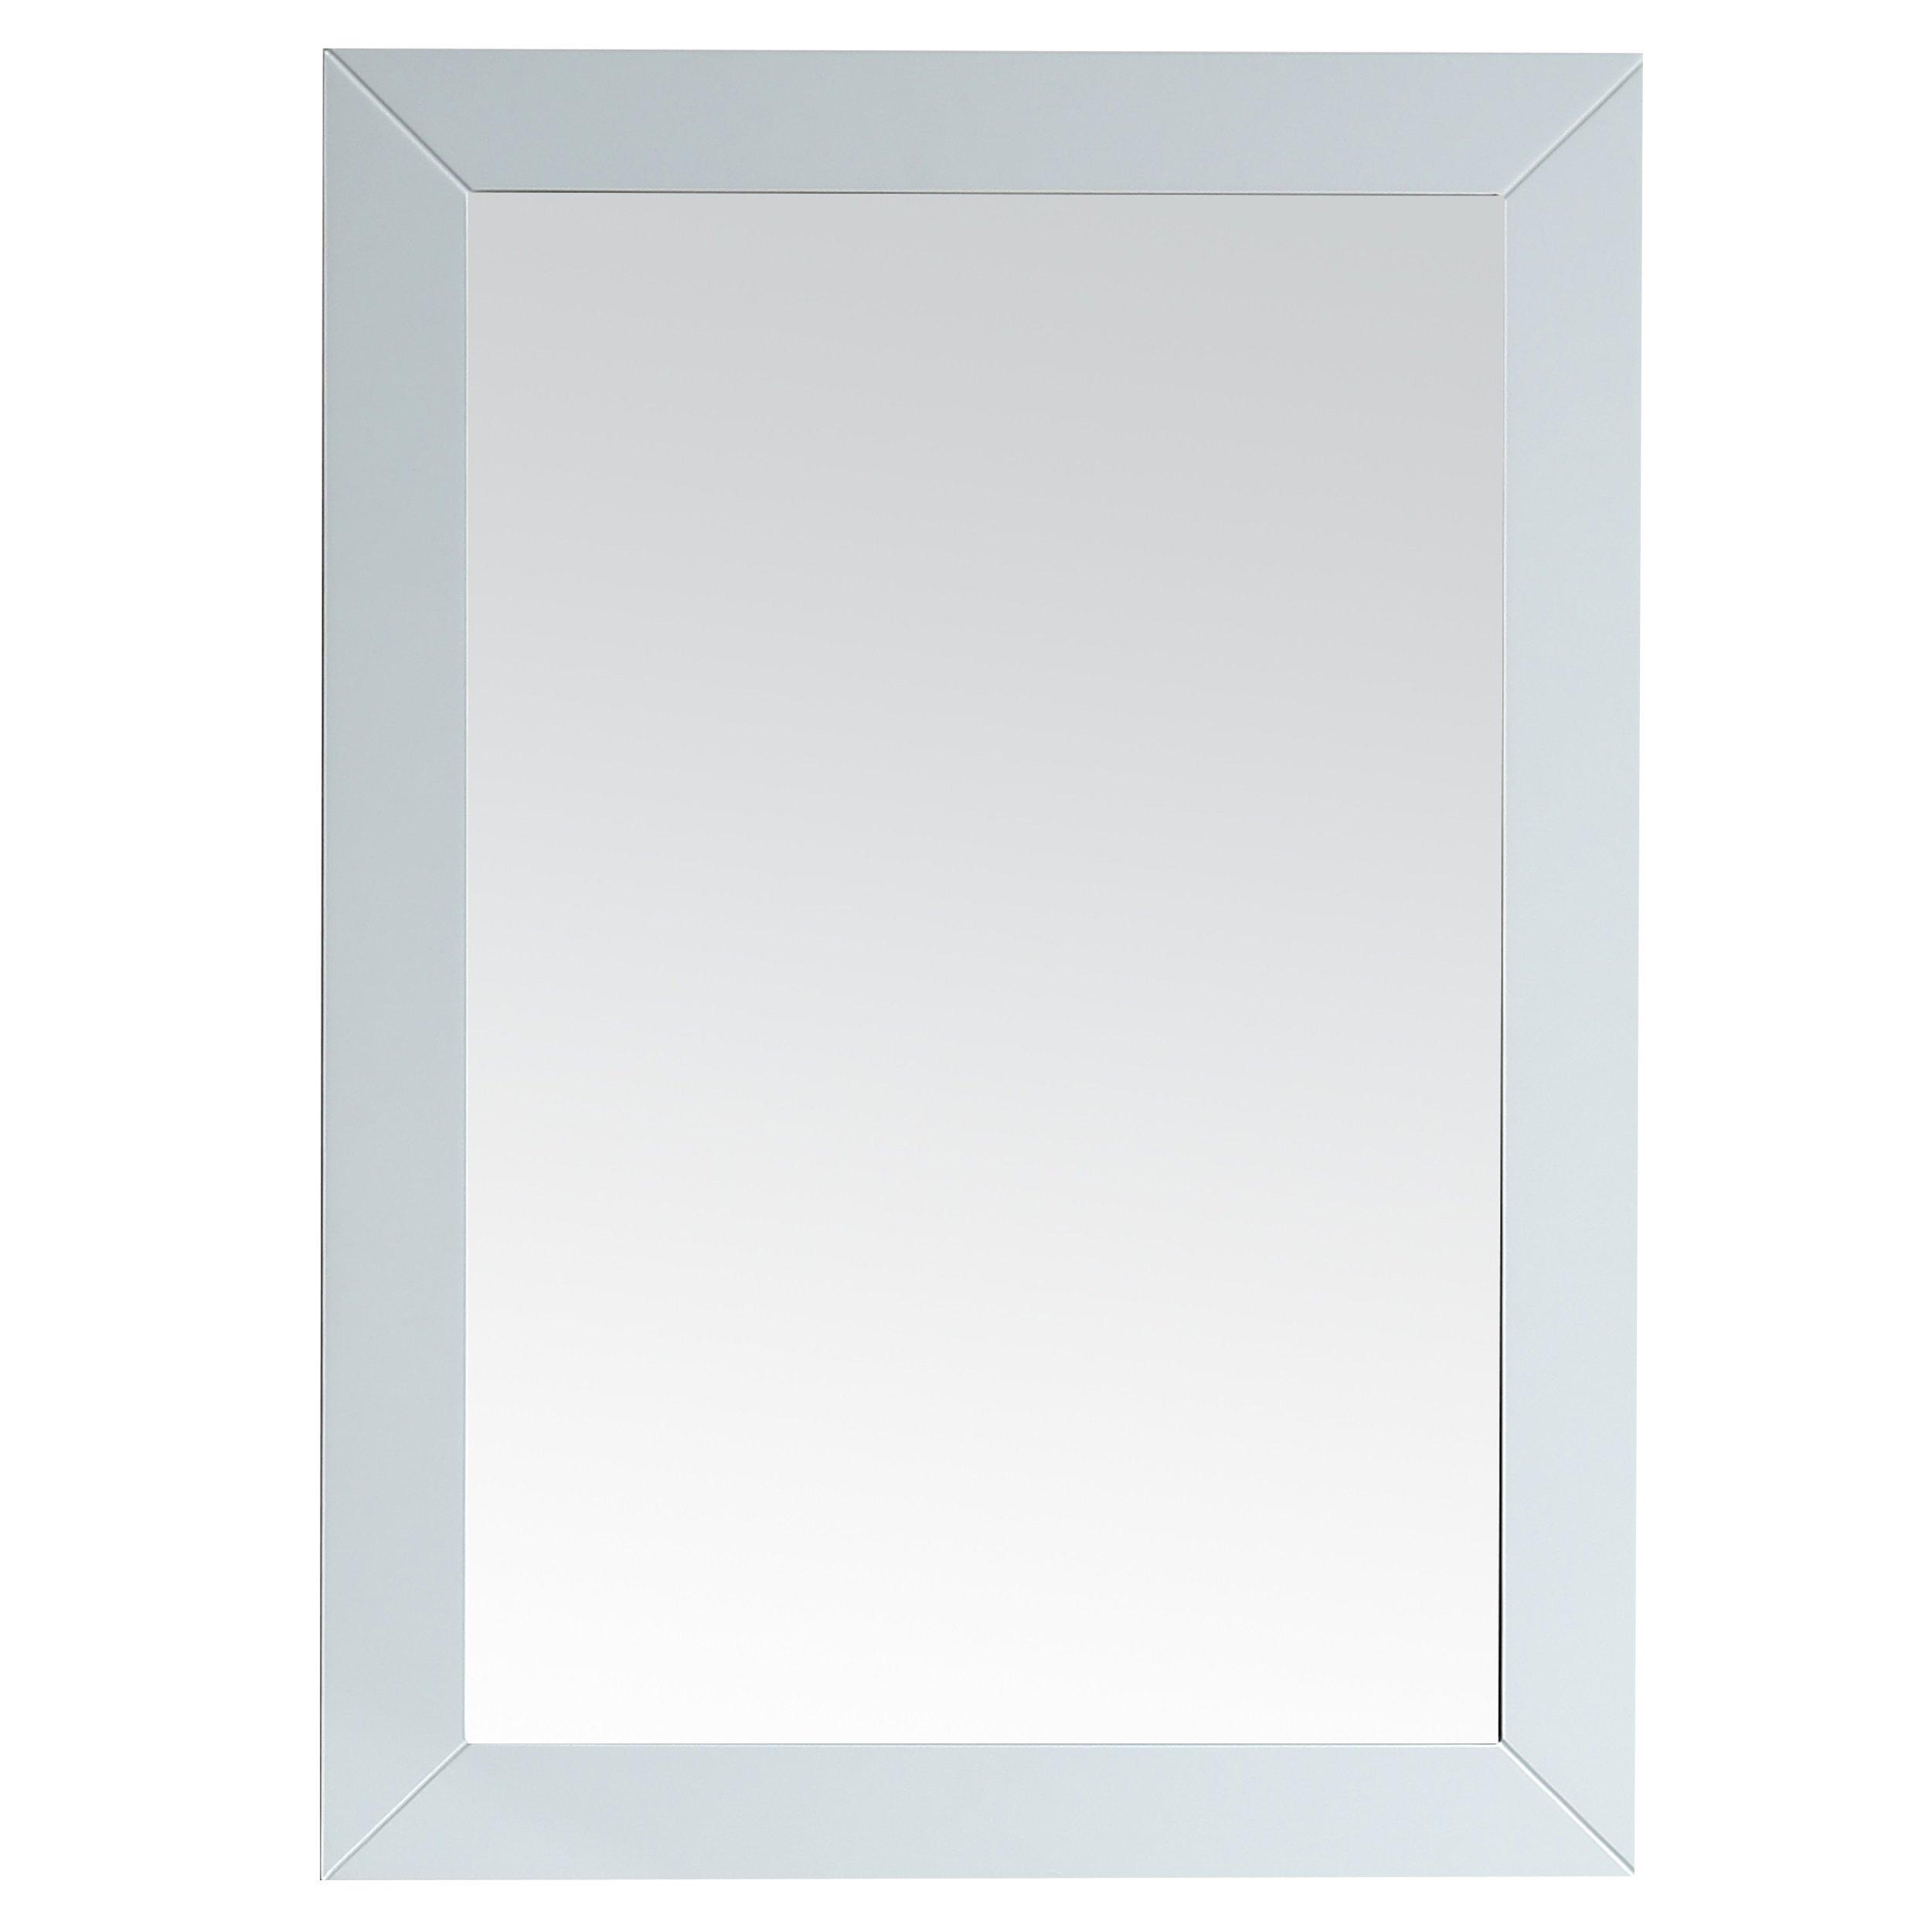 Eviva EVMR69-30WH Acclaim Bathroom Mirror Combination, White by Eviva